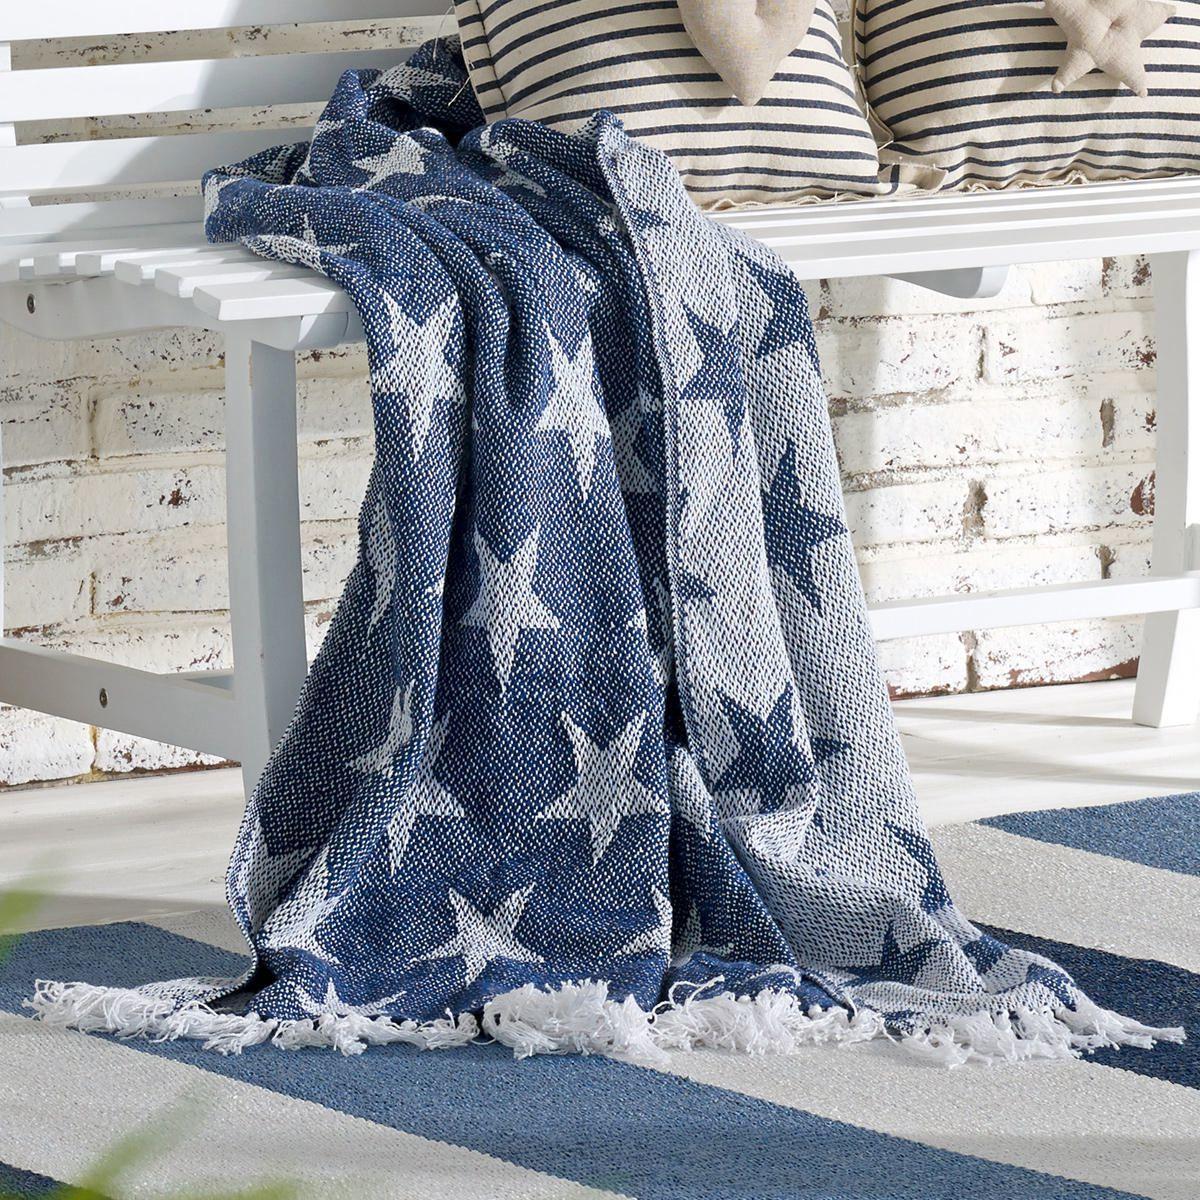 wohndecke sterne aspen dunkelgrau mit sternen with wohndecke sterne cool sterne gzze creme. Black Bedroom Furniture Sets. Home Design Ideas